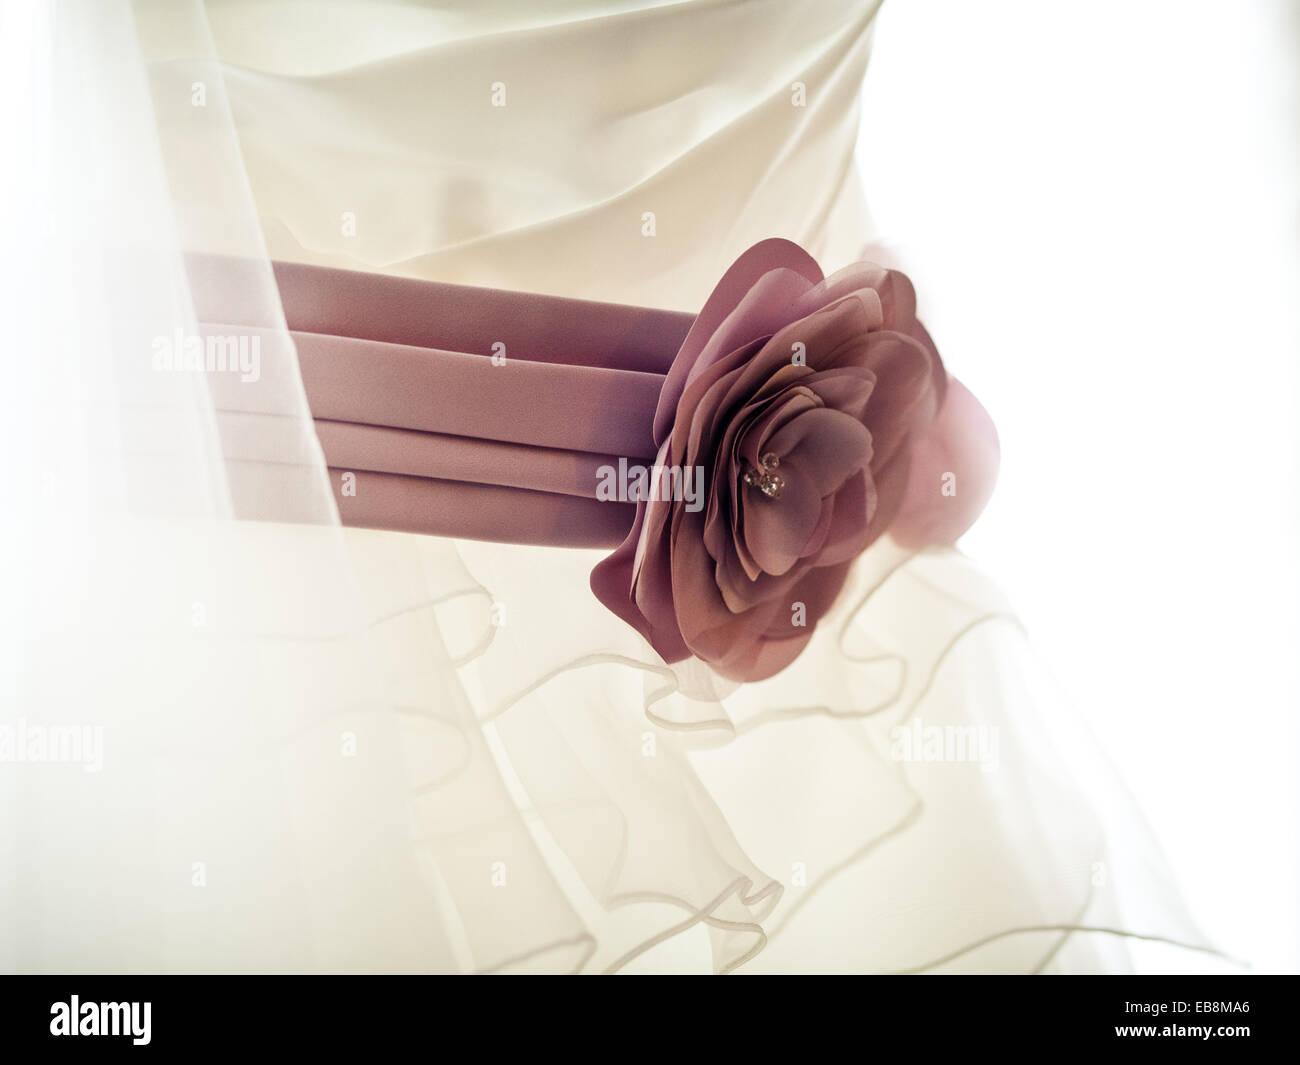 Pink silk flower band or belt on cream / white wedding dress, close up detail - Stock Image